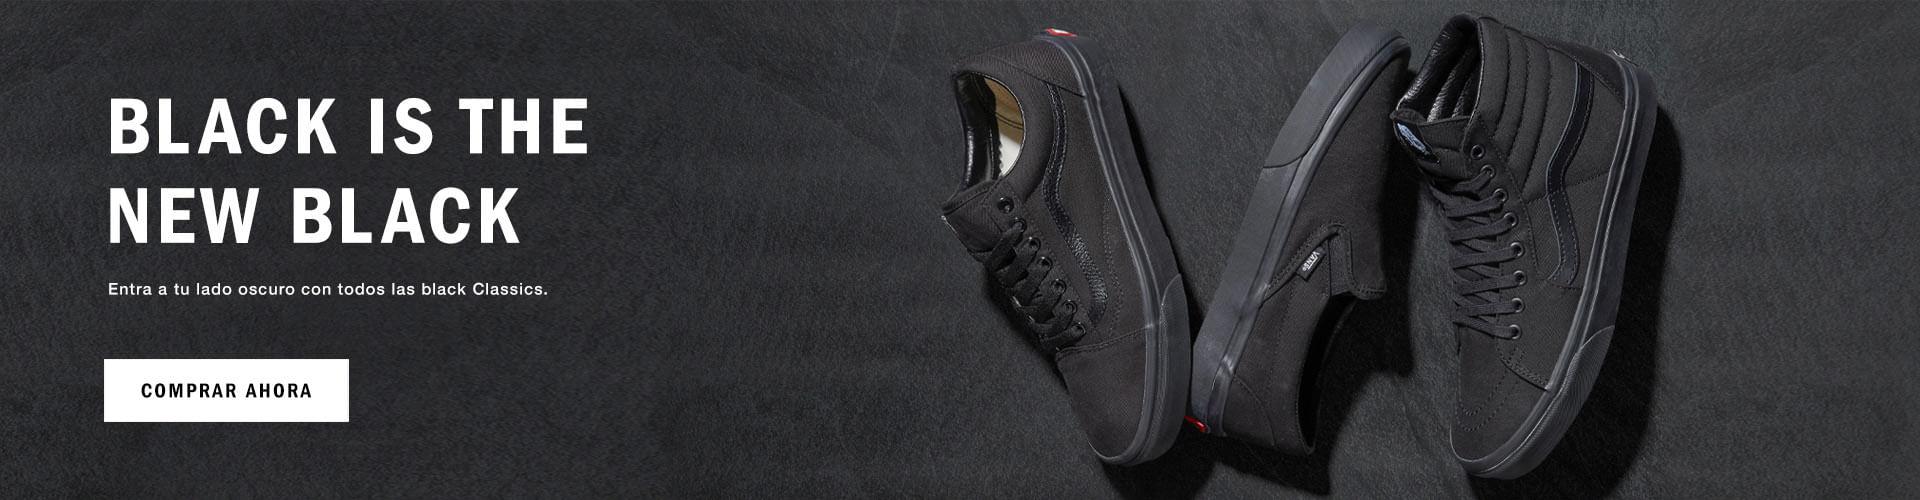 BLACK CLASSICS | Vans Chile